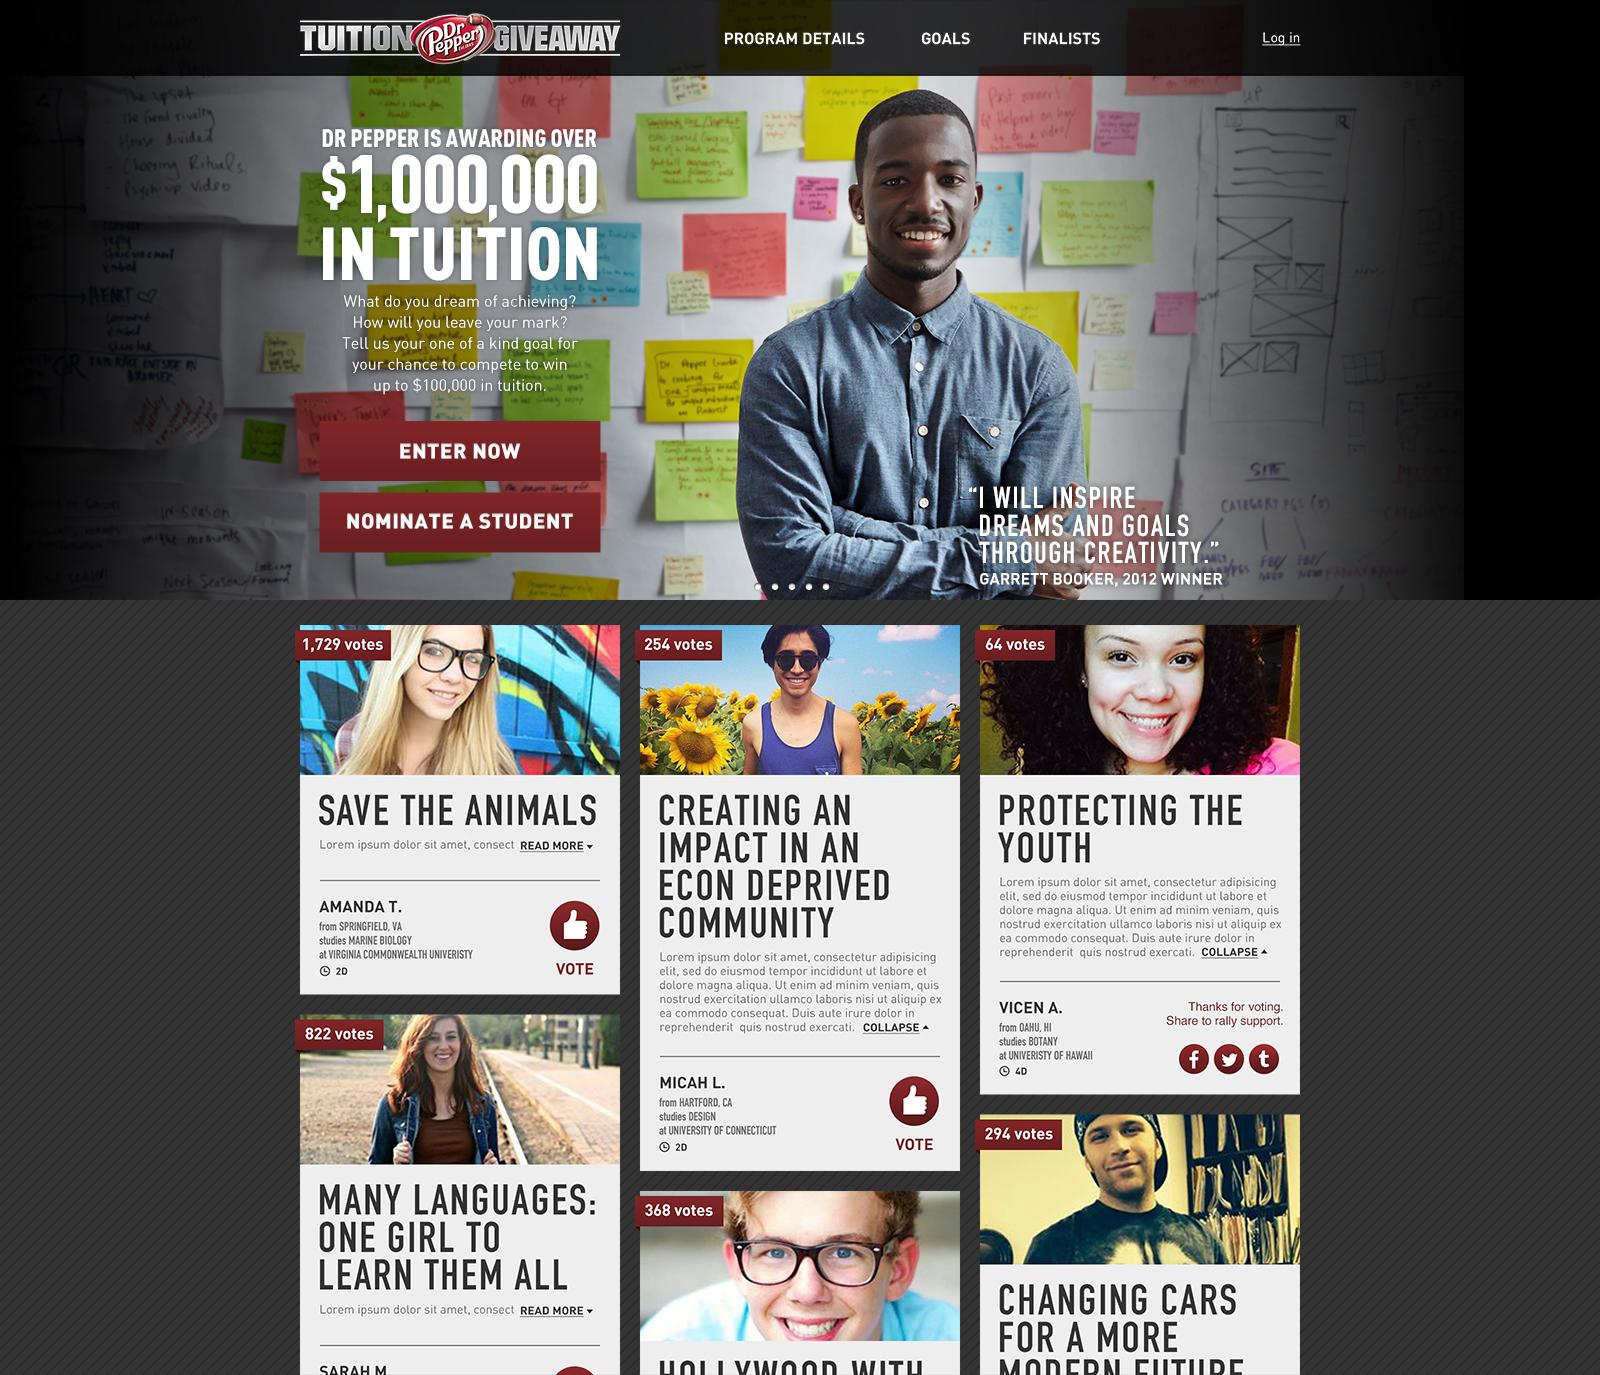 tuition3_0006_7.jpg